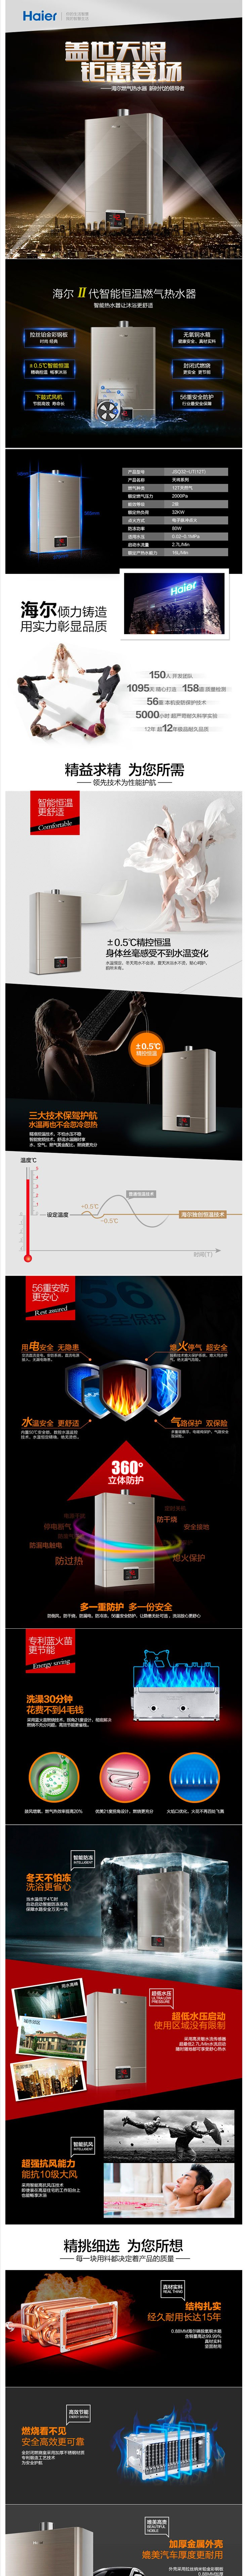 haier 海尔 智能恒温燃气热水器 jsq32-ut(12t)